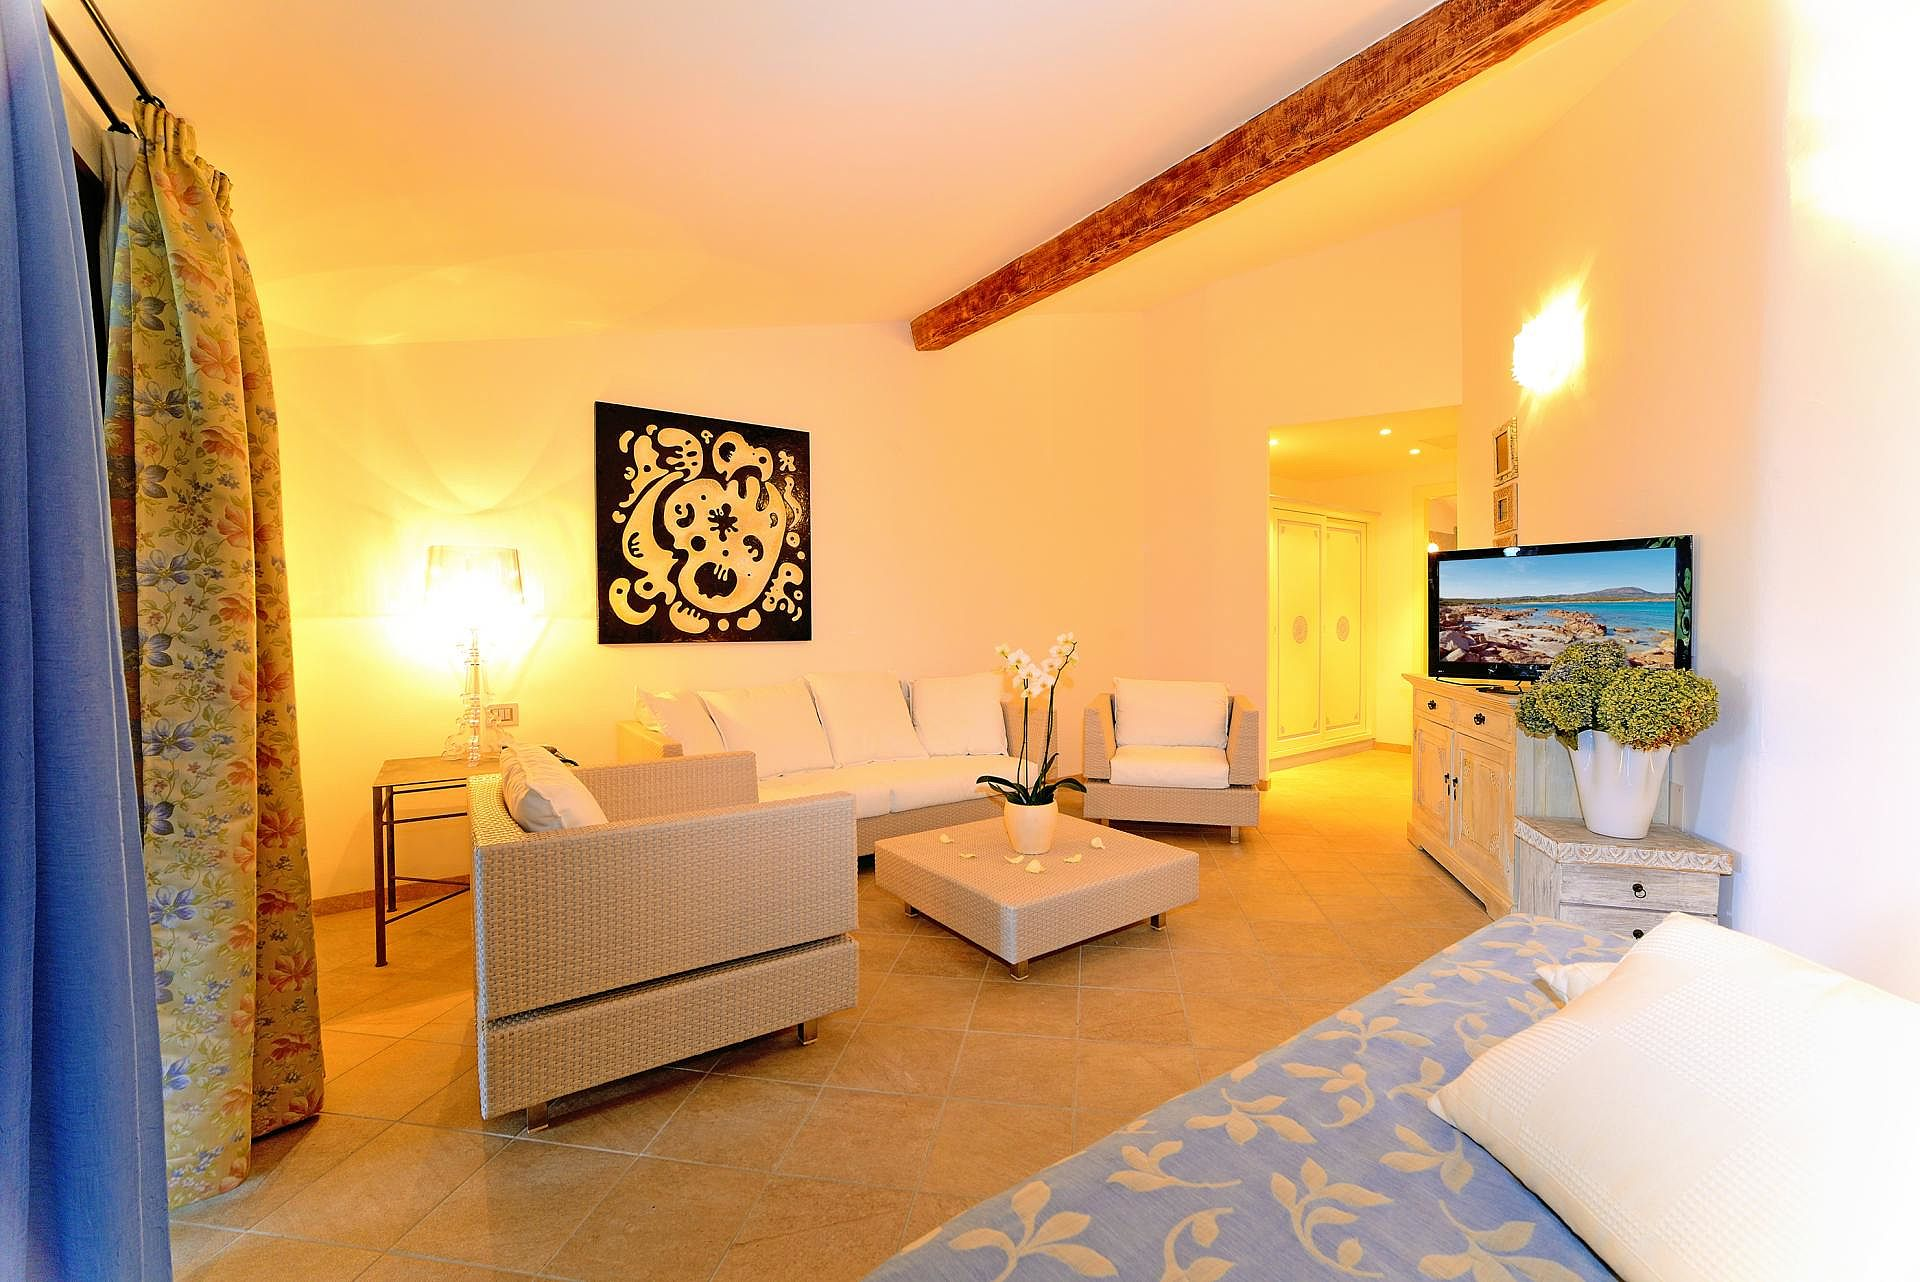 http://extranet.jetlinetravel.info/express-images/express_hotel_ollastu_residence.jpg